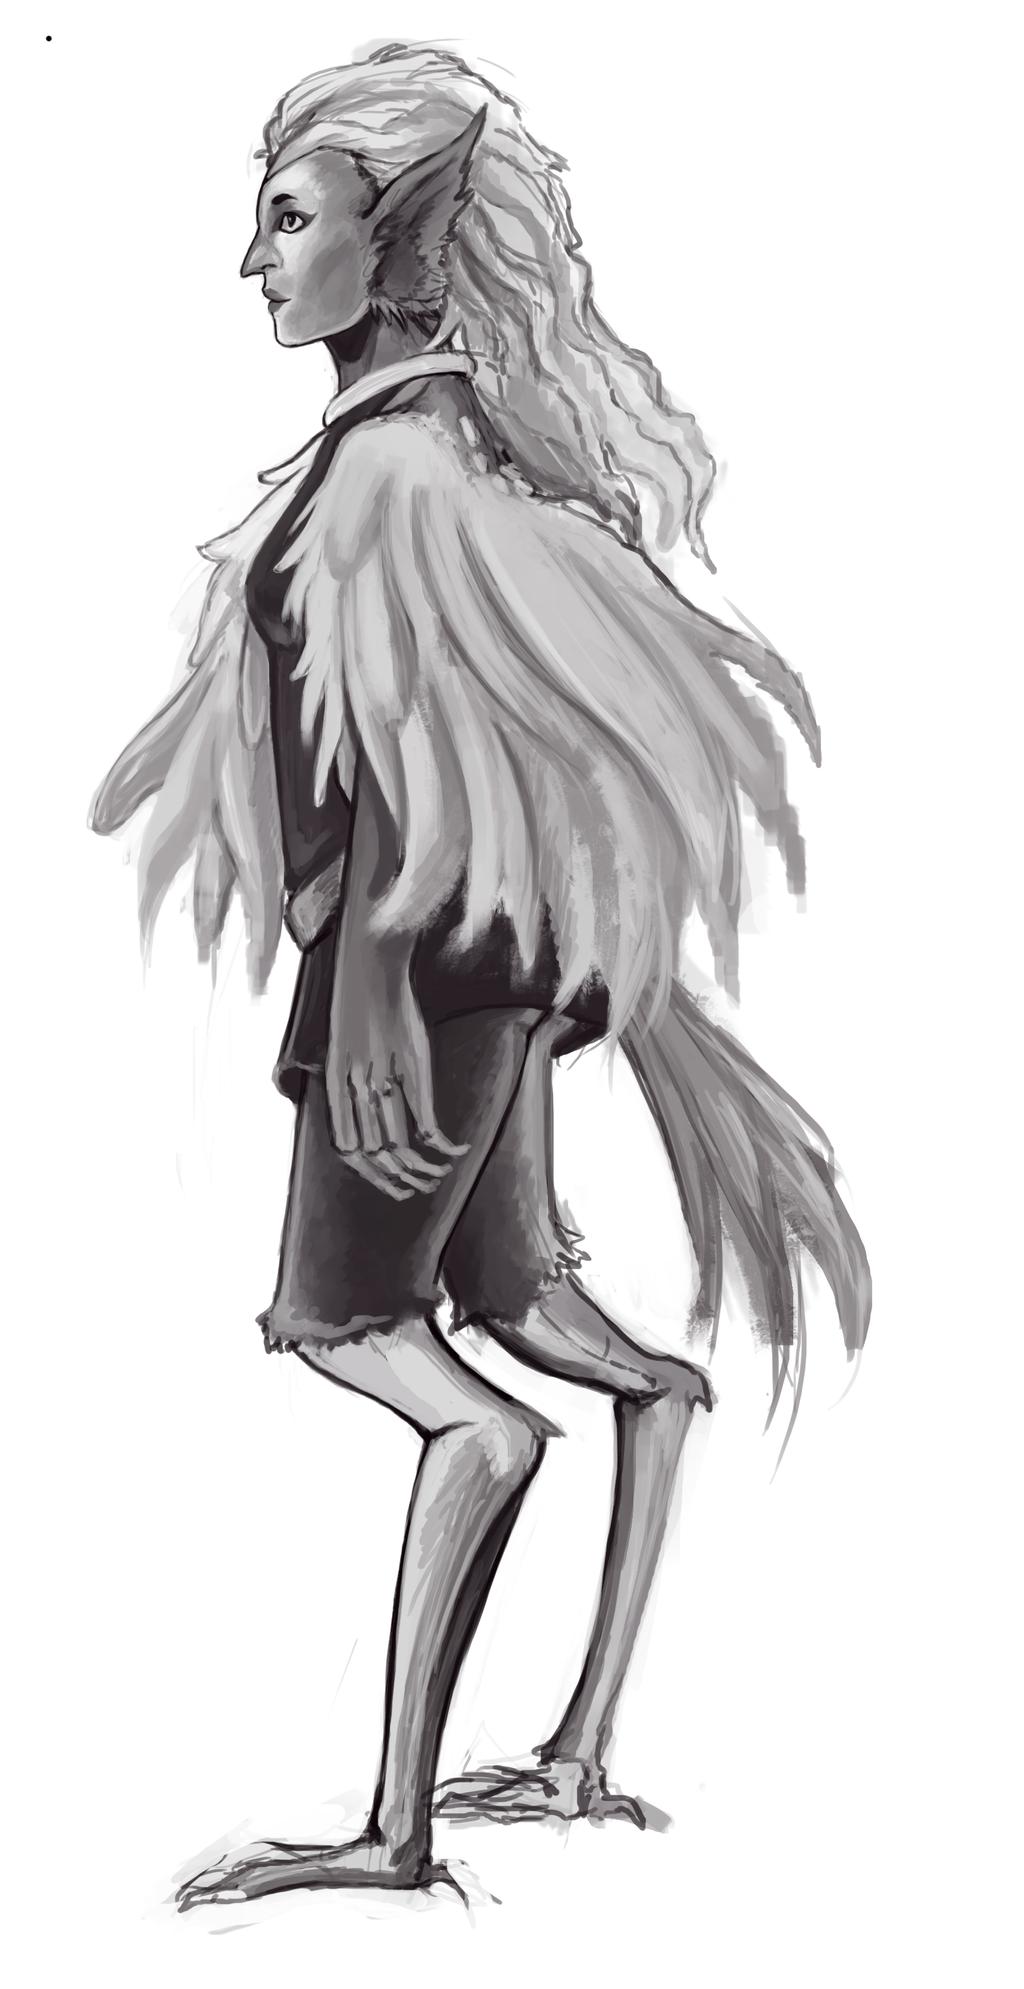 bird race concept art by MidnightZone